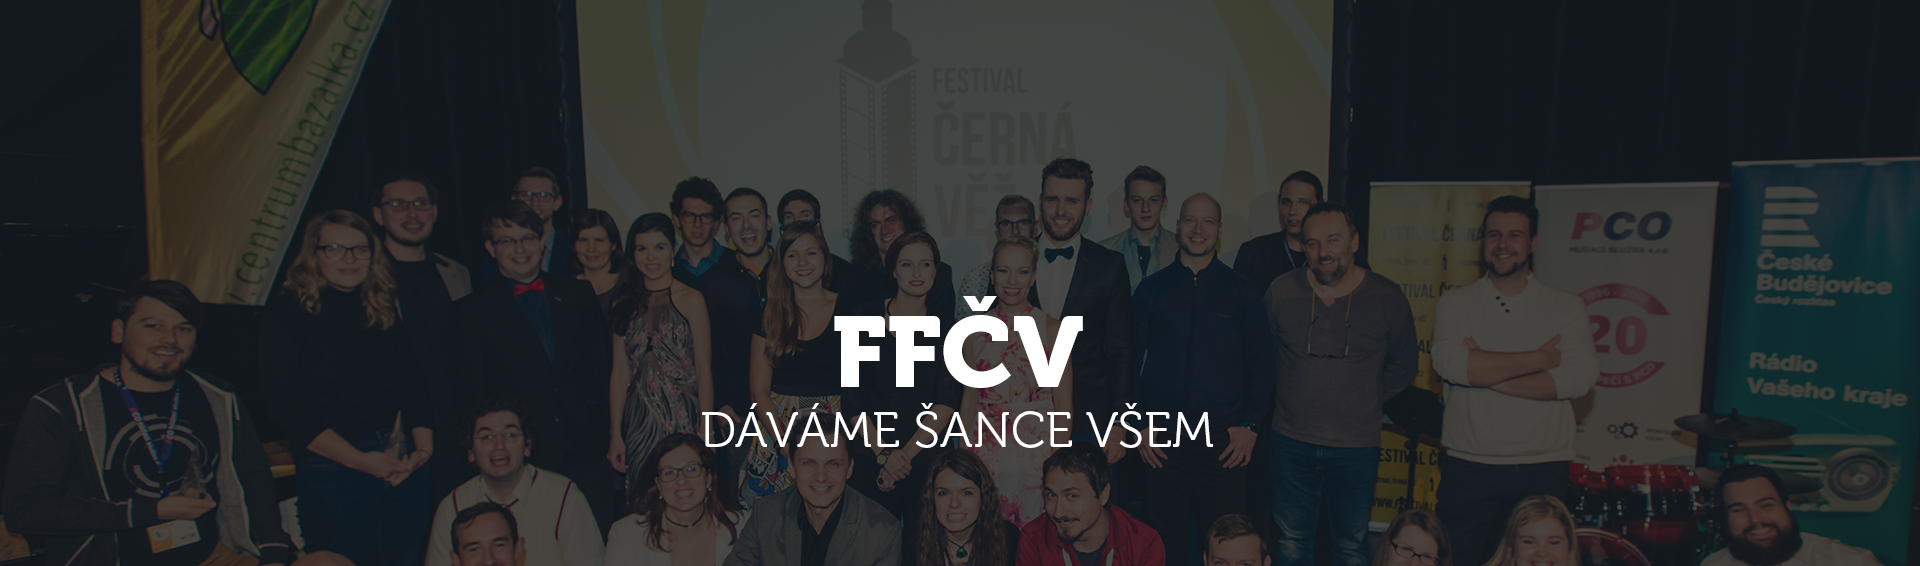 FFCV2018-uvodni-foto-na-web-_-o-festivalu